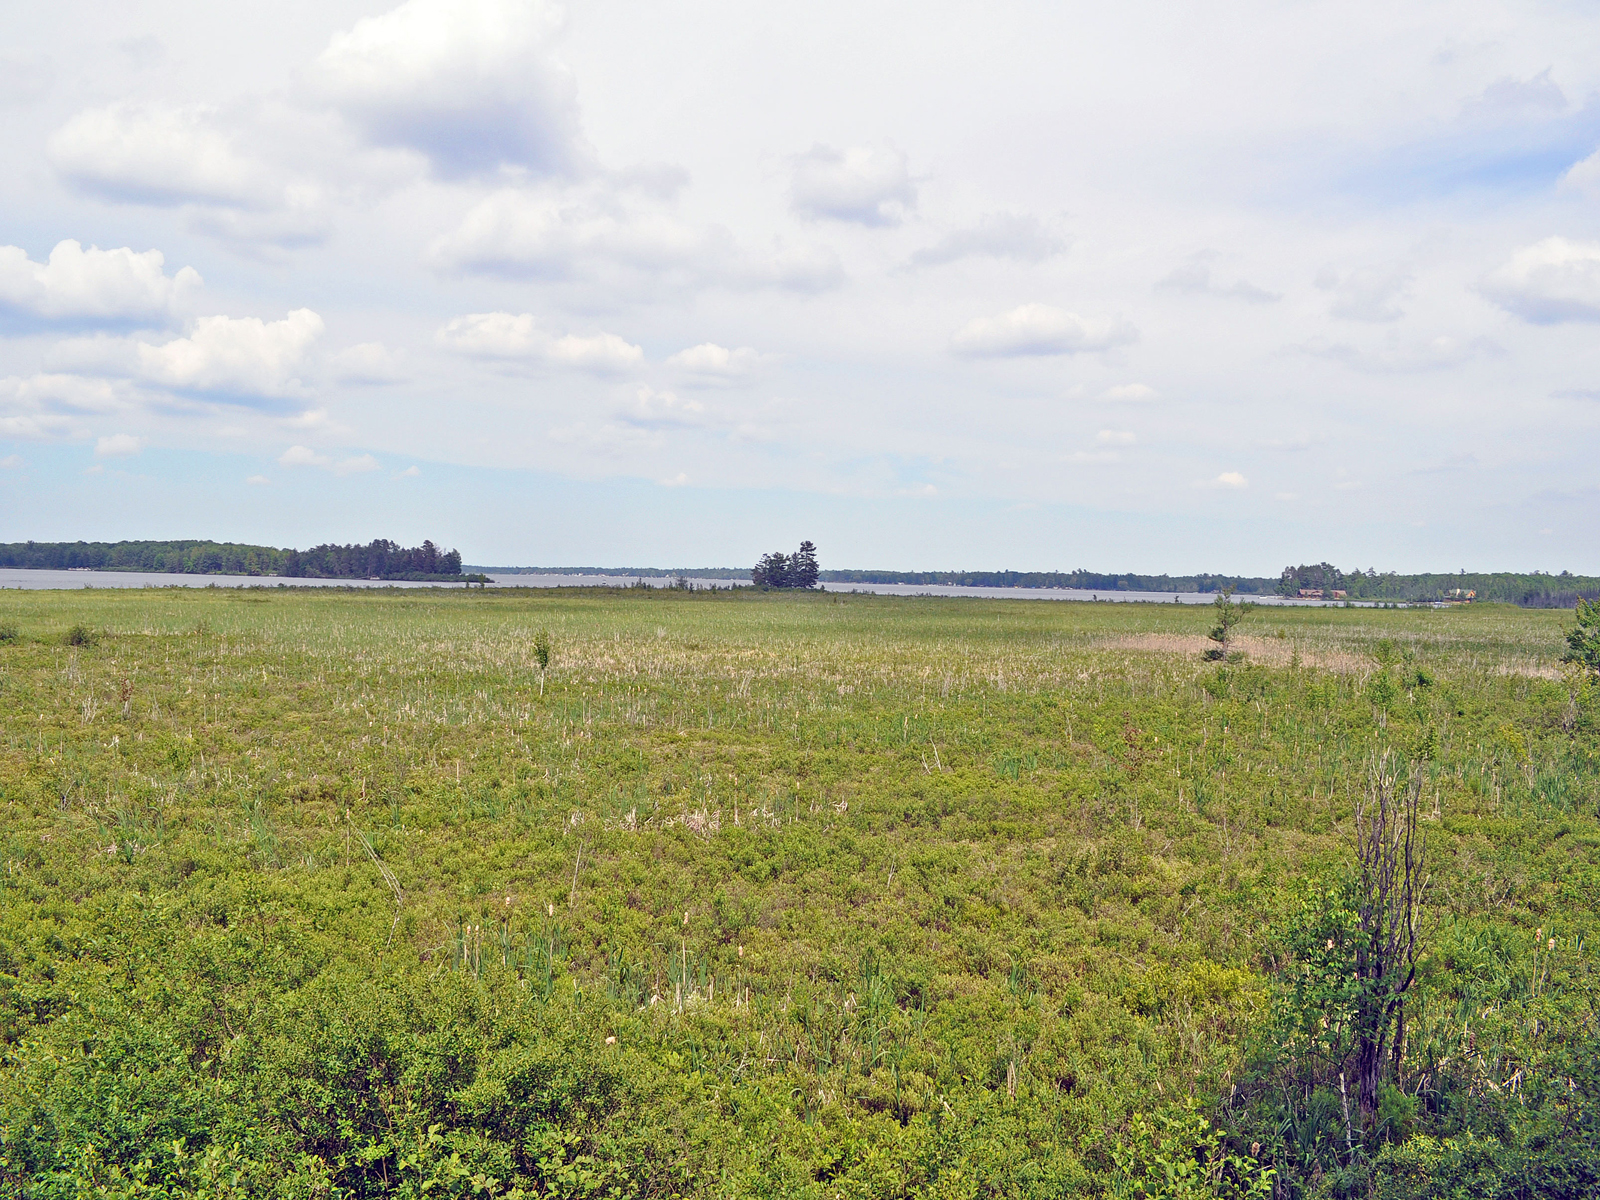 Land for Sale at Richfield Township 000 Jennifer Lane St. Helen, Michigan 48656 United States